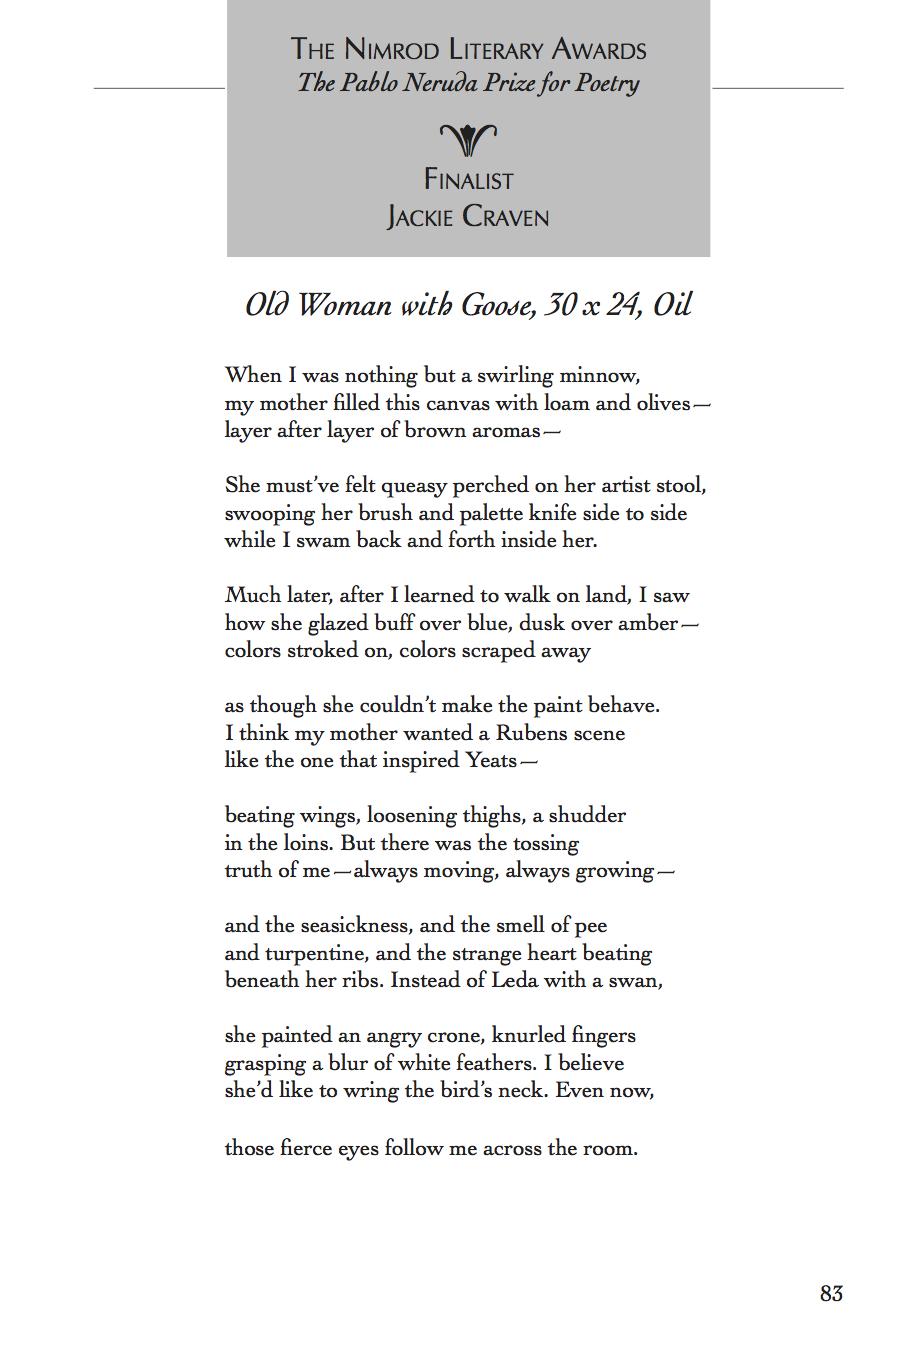 Poem by Jackie Craven